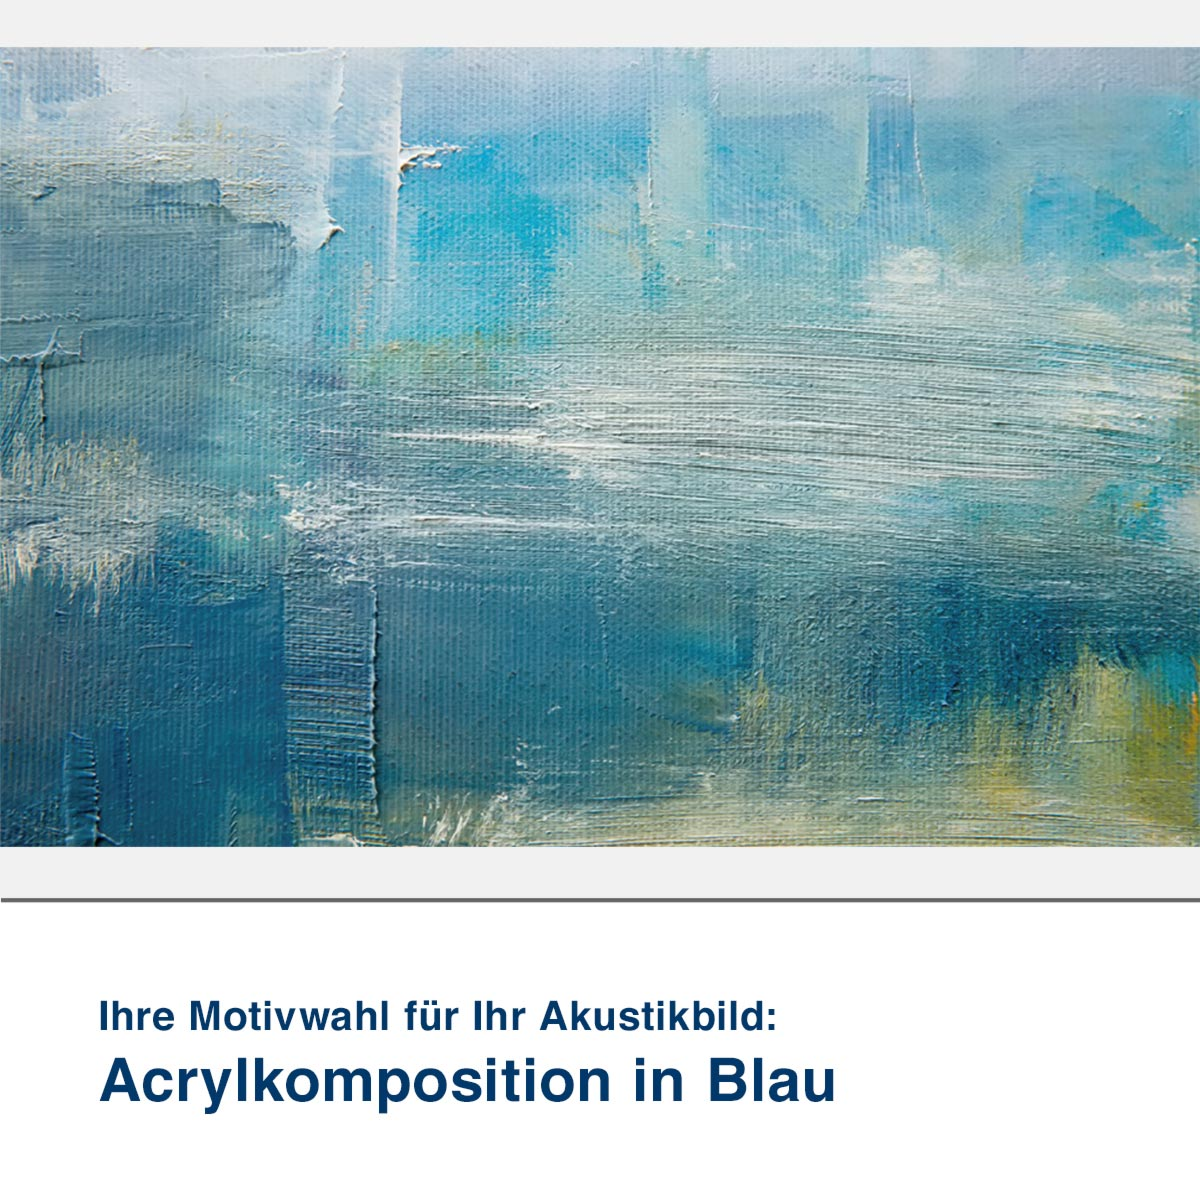 Akustikbild Motiv Acrylkomposition in Blau